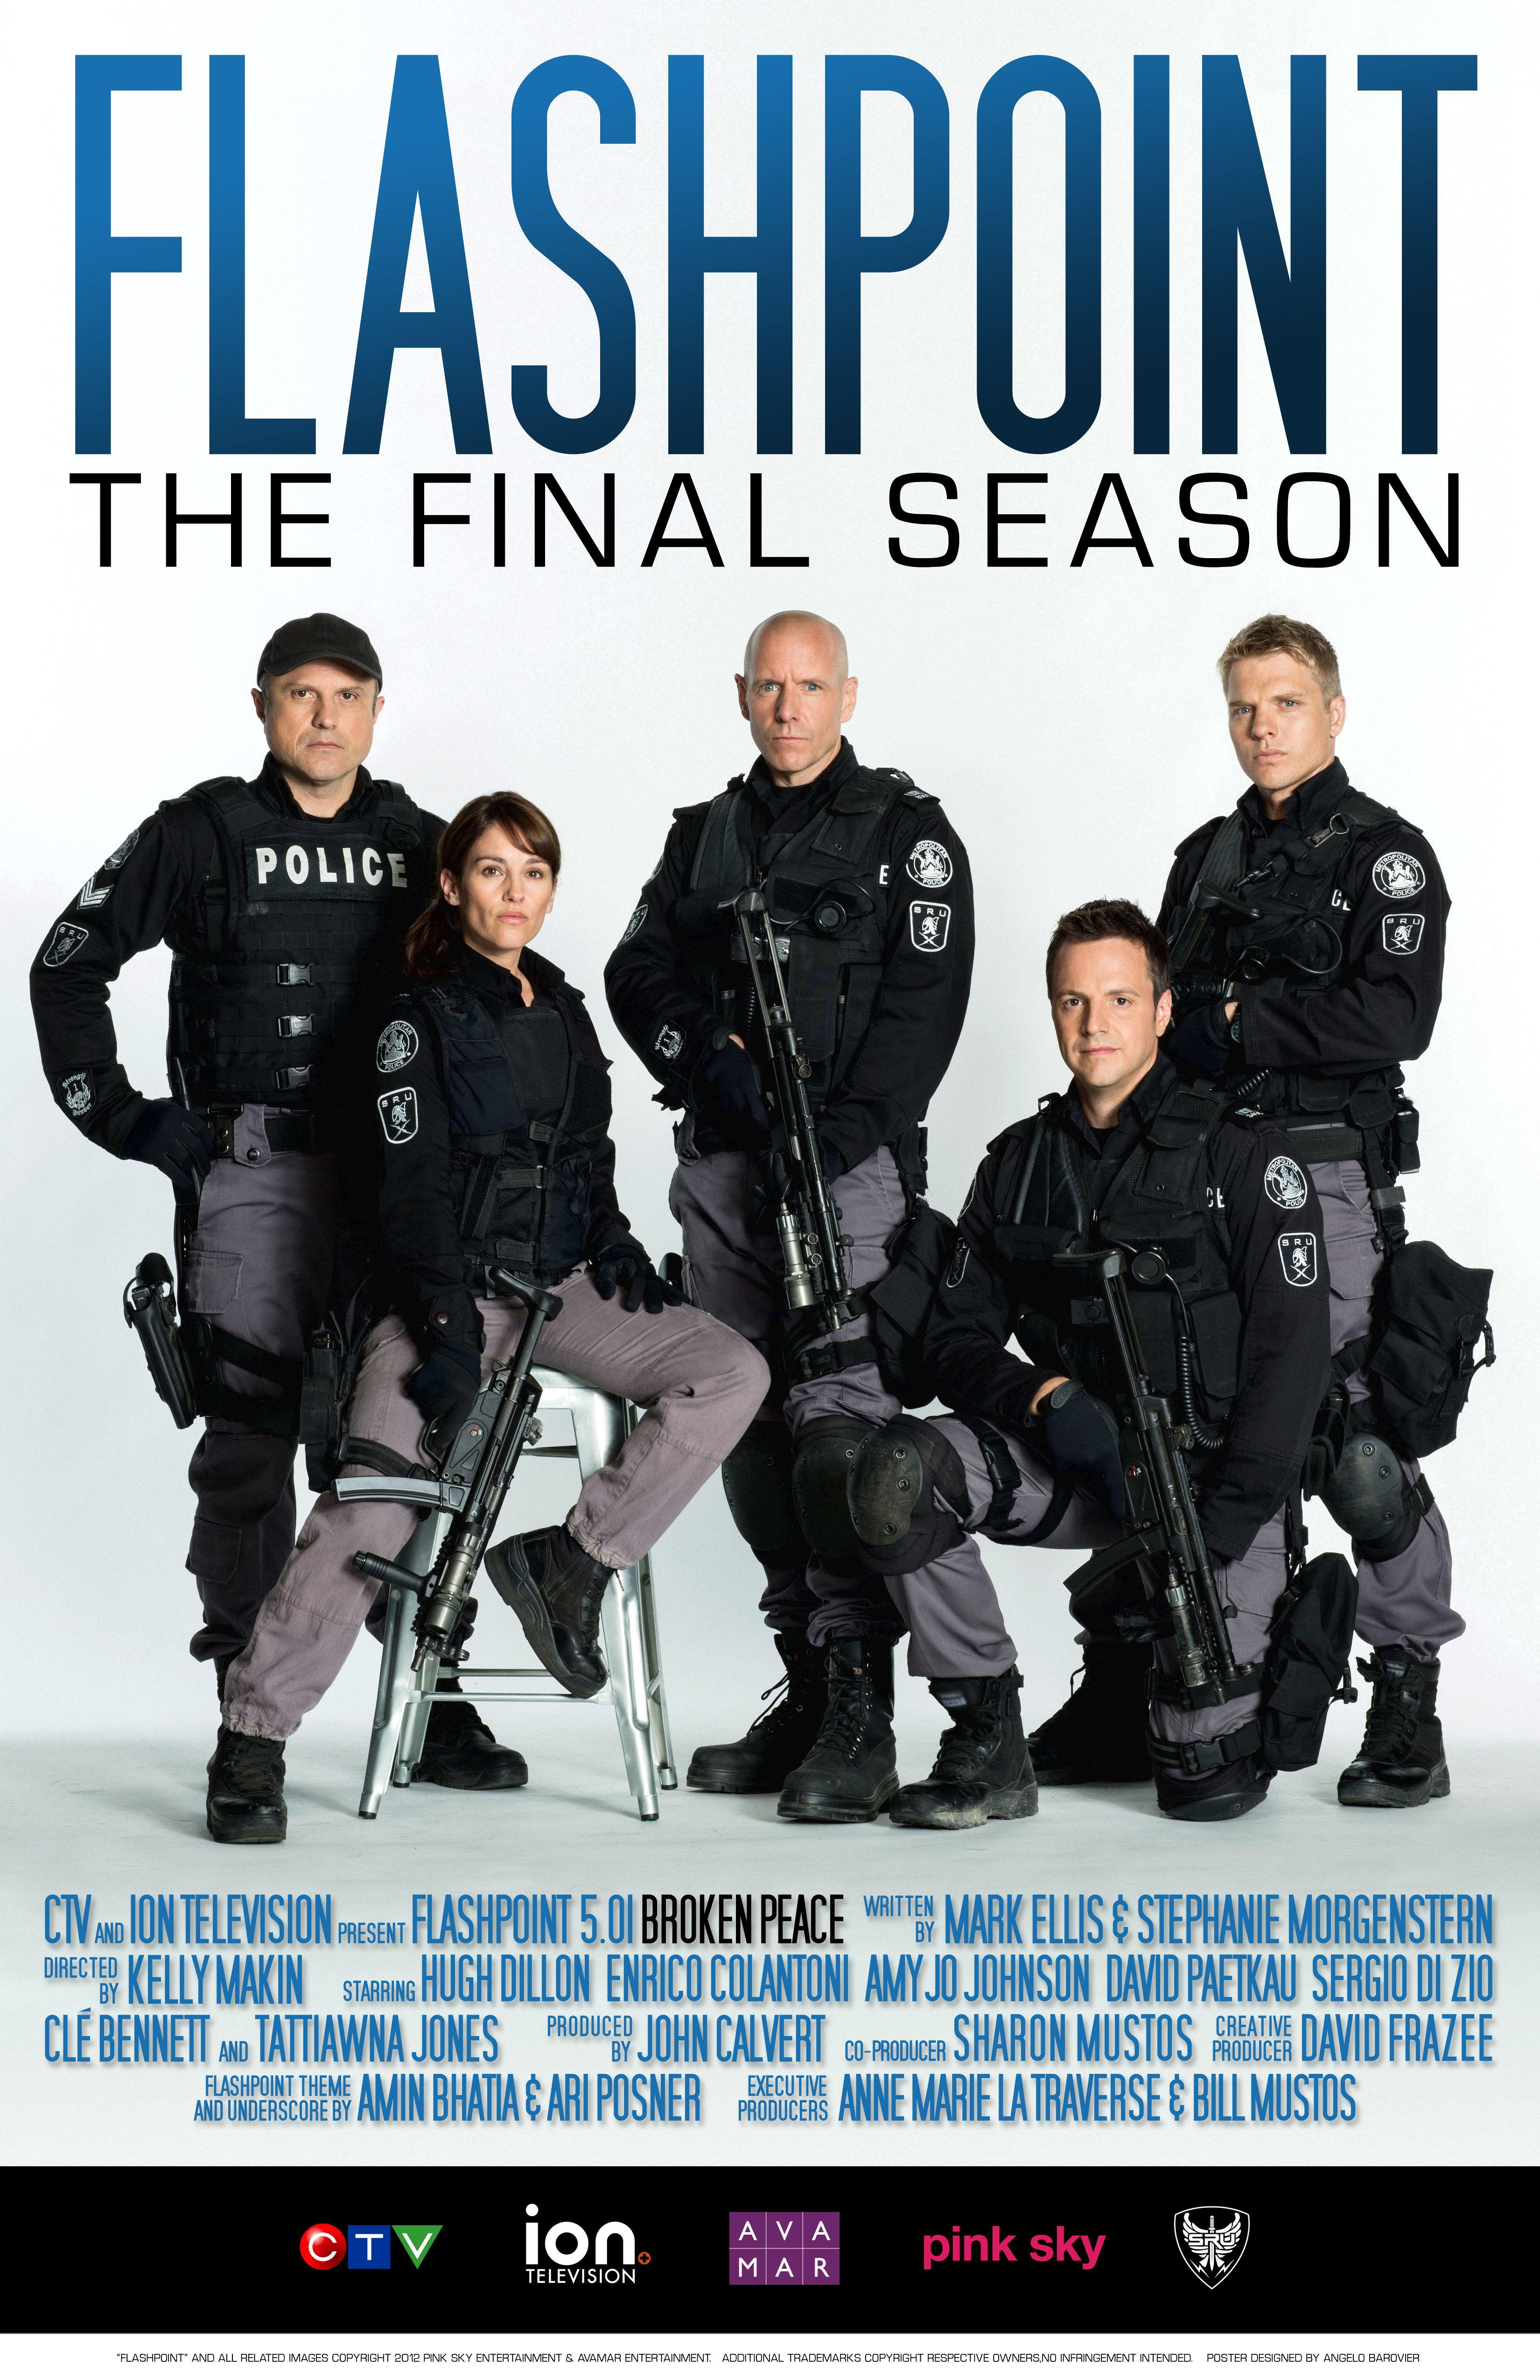 Season 5 of Flashpoint. The final season. Subtitled